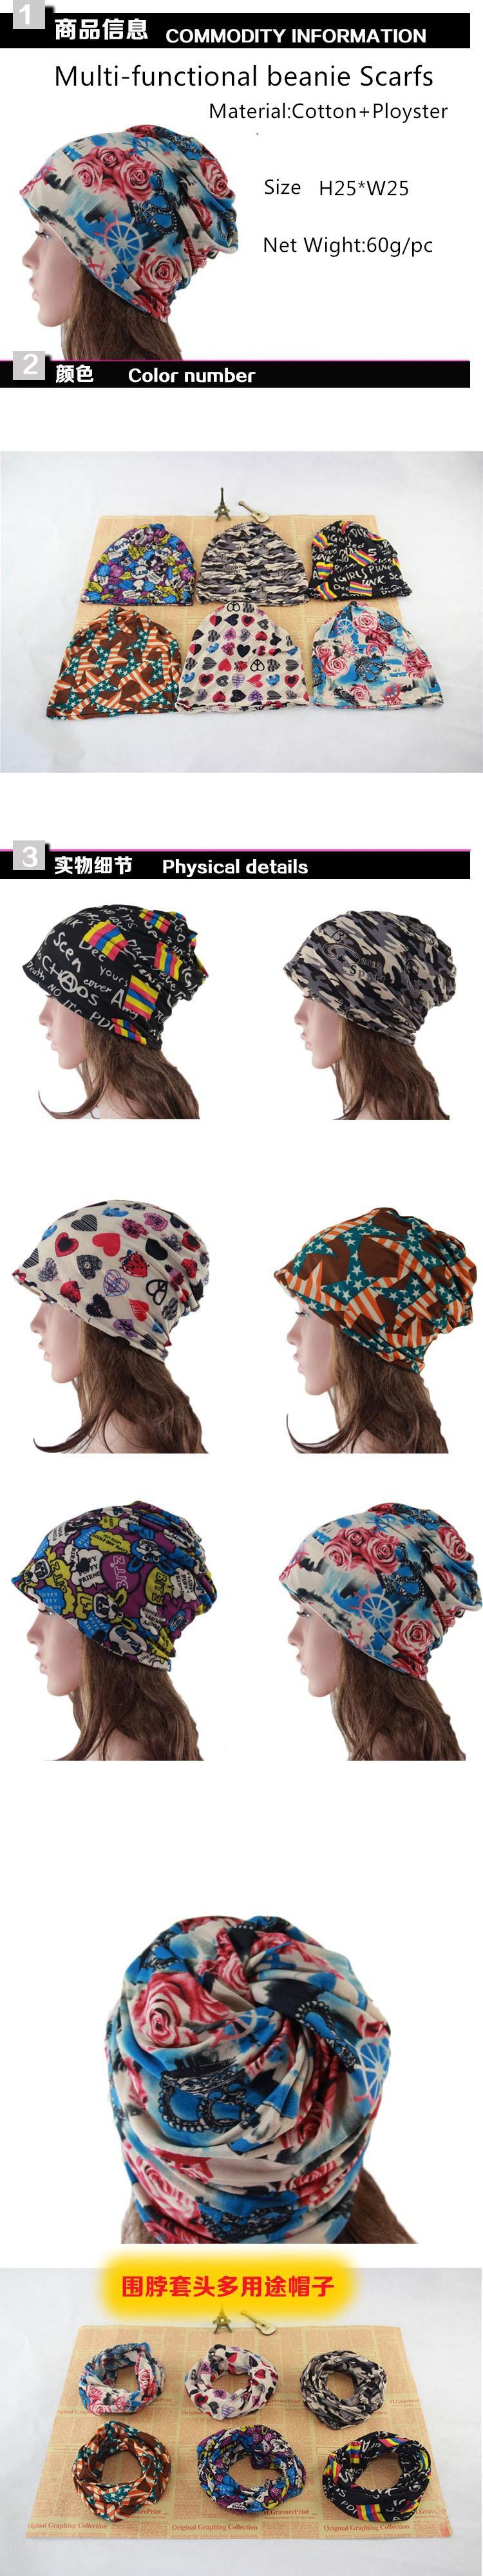 Женская шапка XB 2015 /* #a/149 A-149